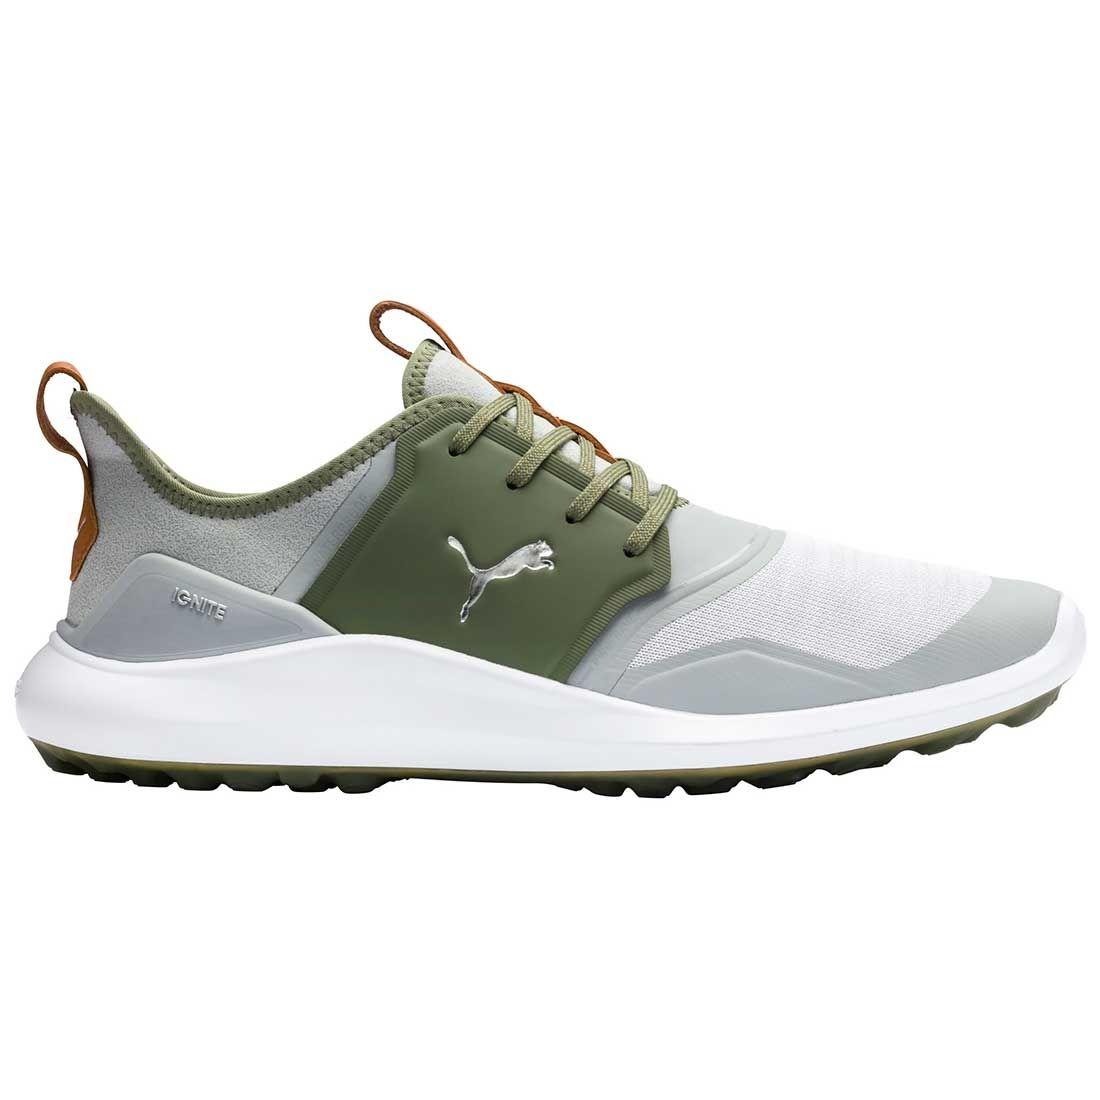 Buy Puma Ignite NXT Golf Shoes High